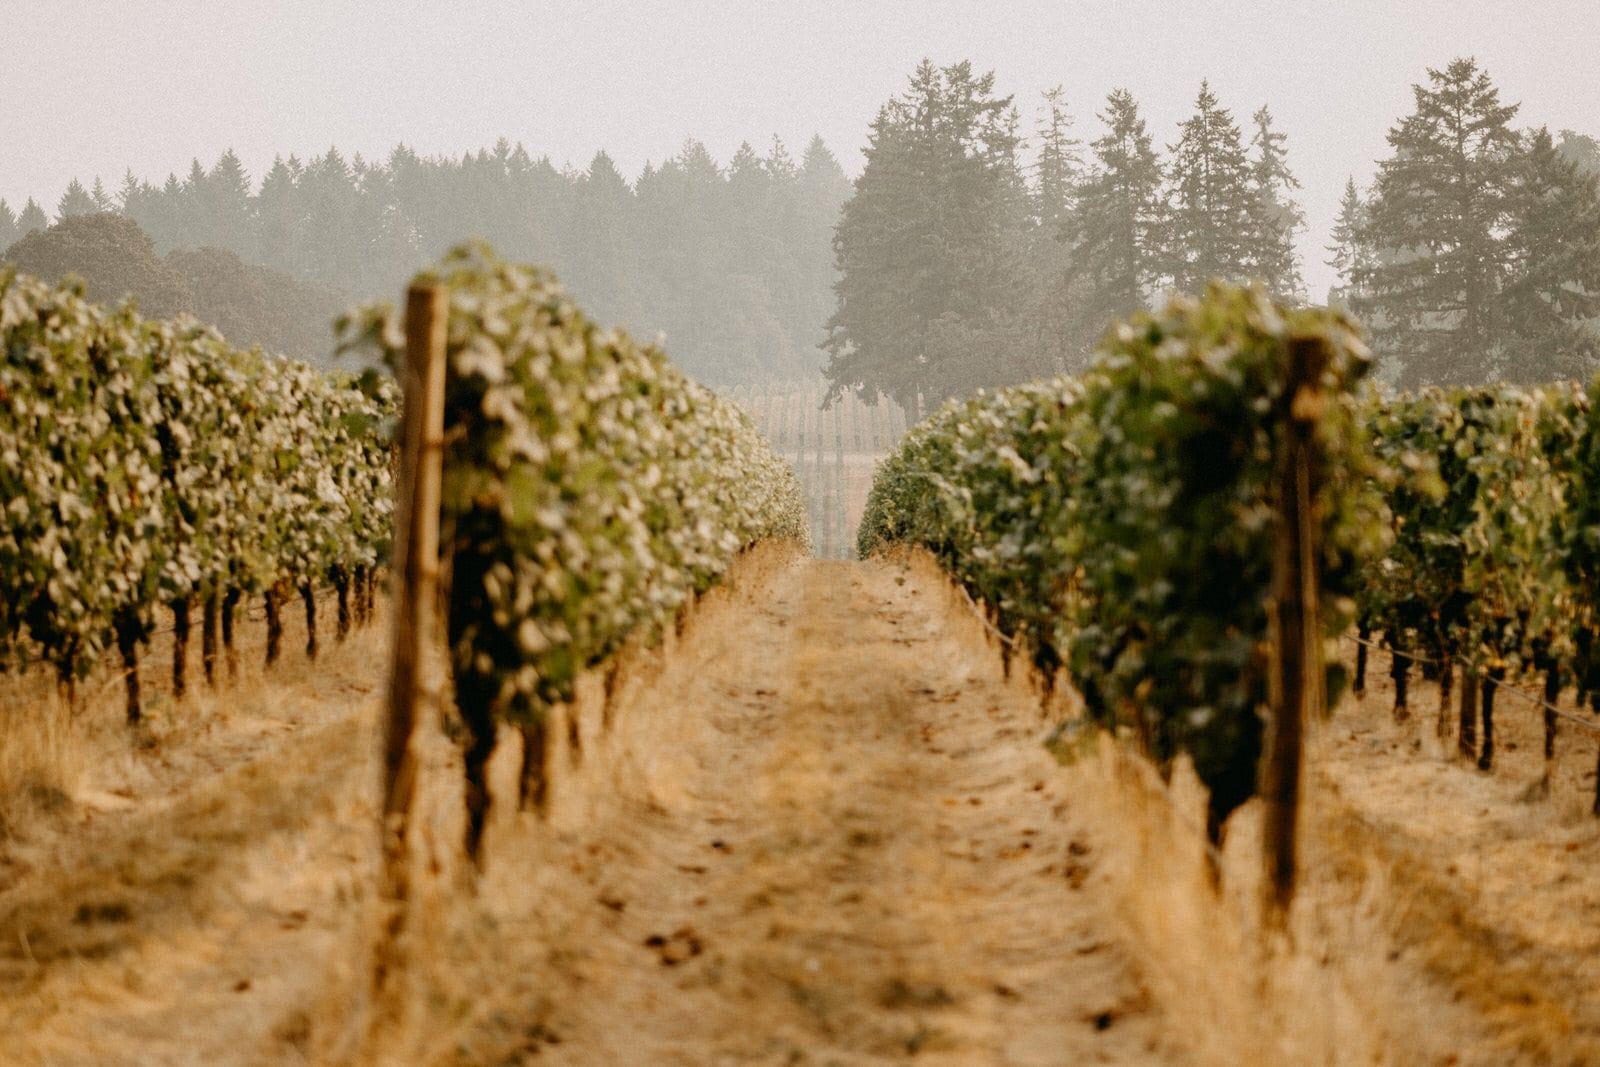 domaine de broglie vineyard in oregon